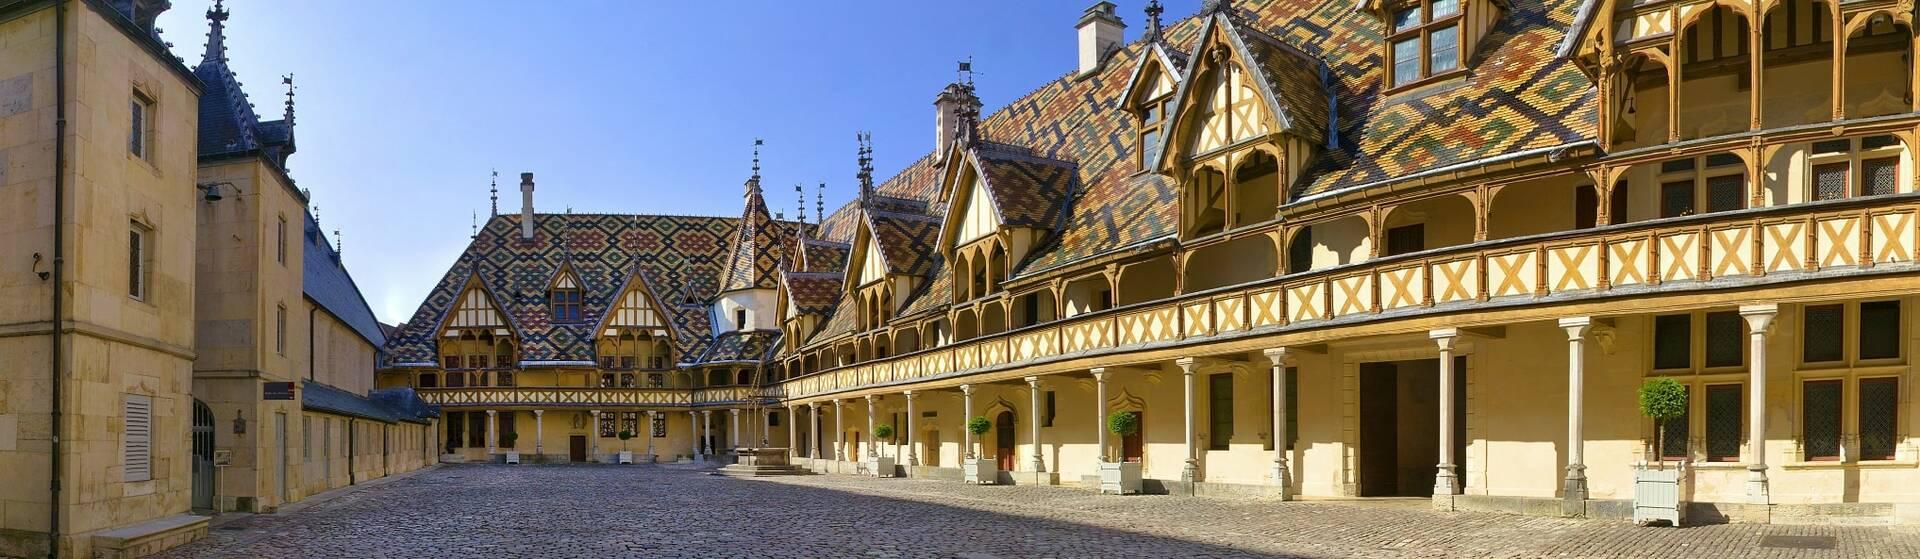 L Hotel De Beaune